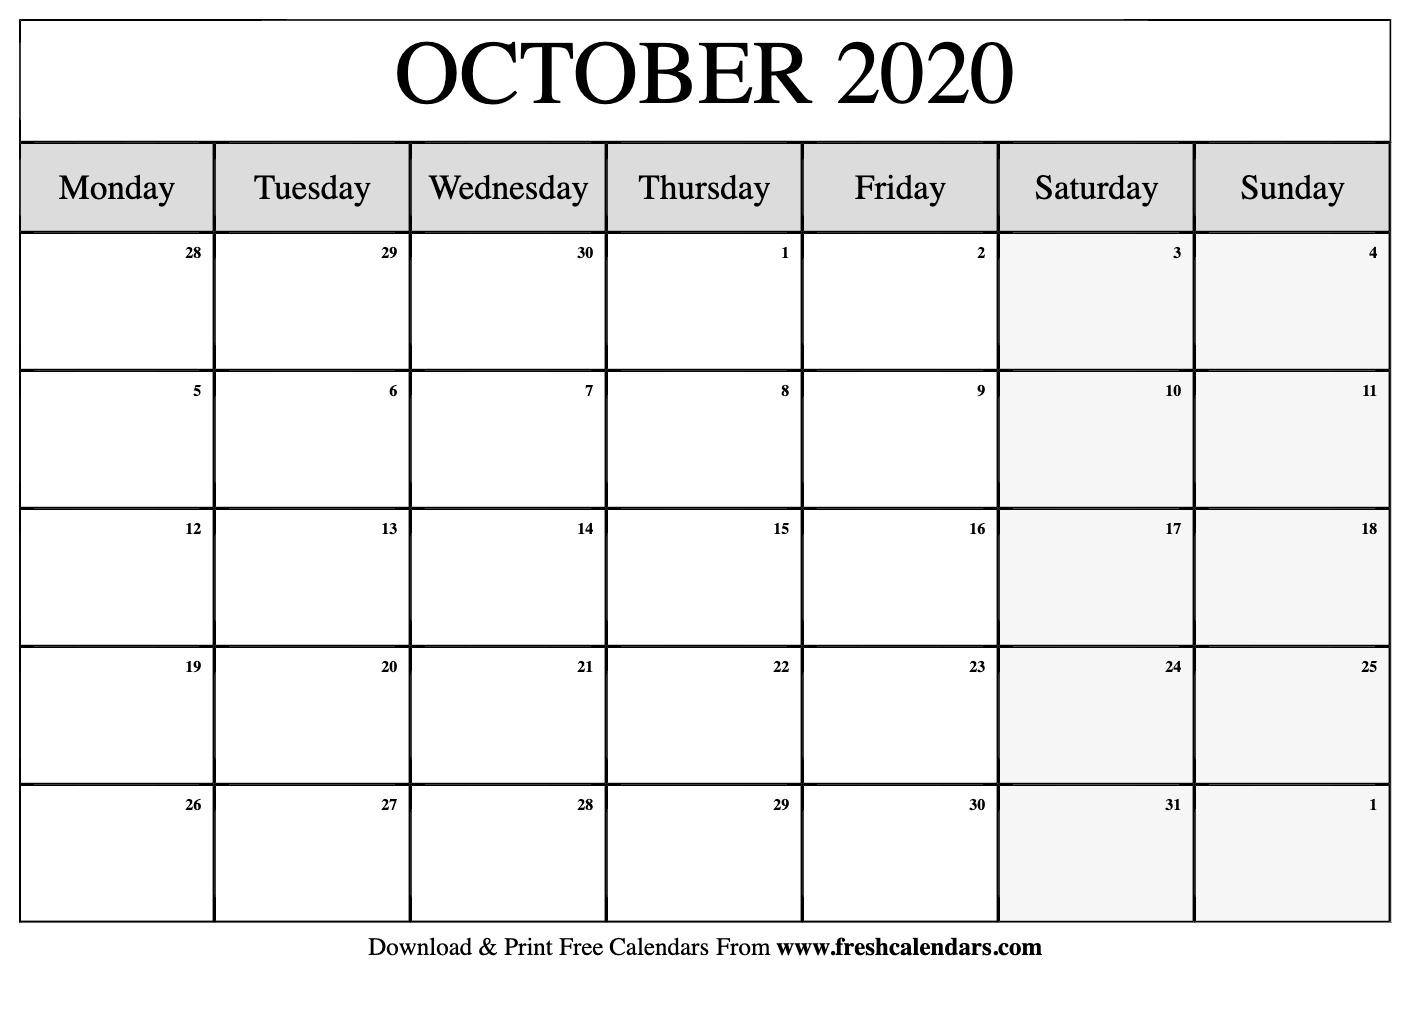 Free Printable October 2020 Calendar throughout 2020 Calendar Template Monday Start